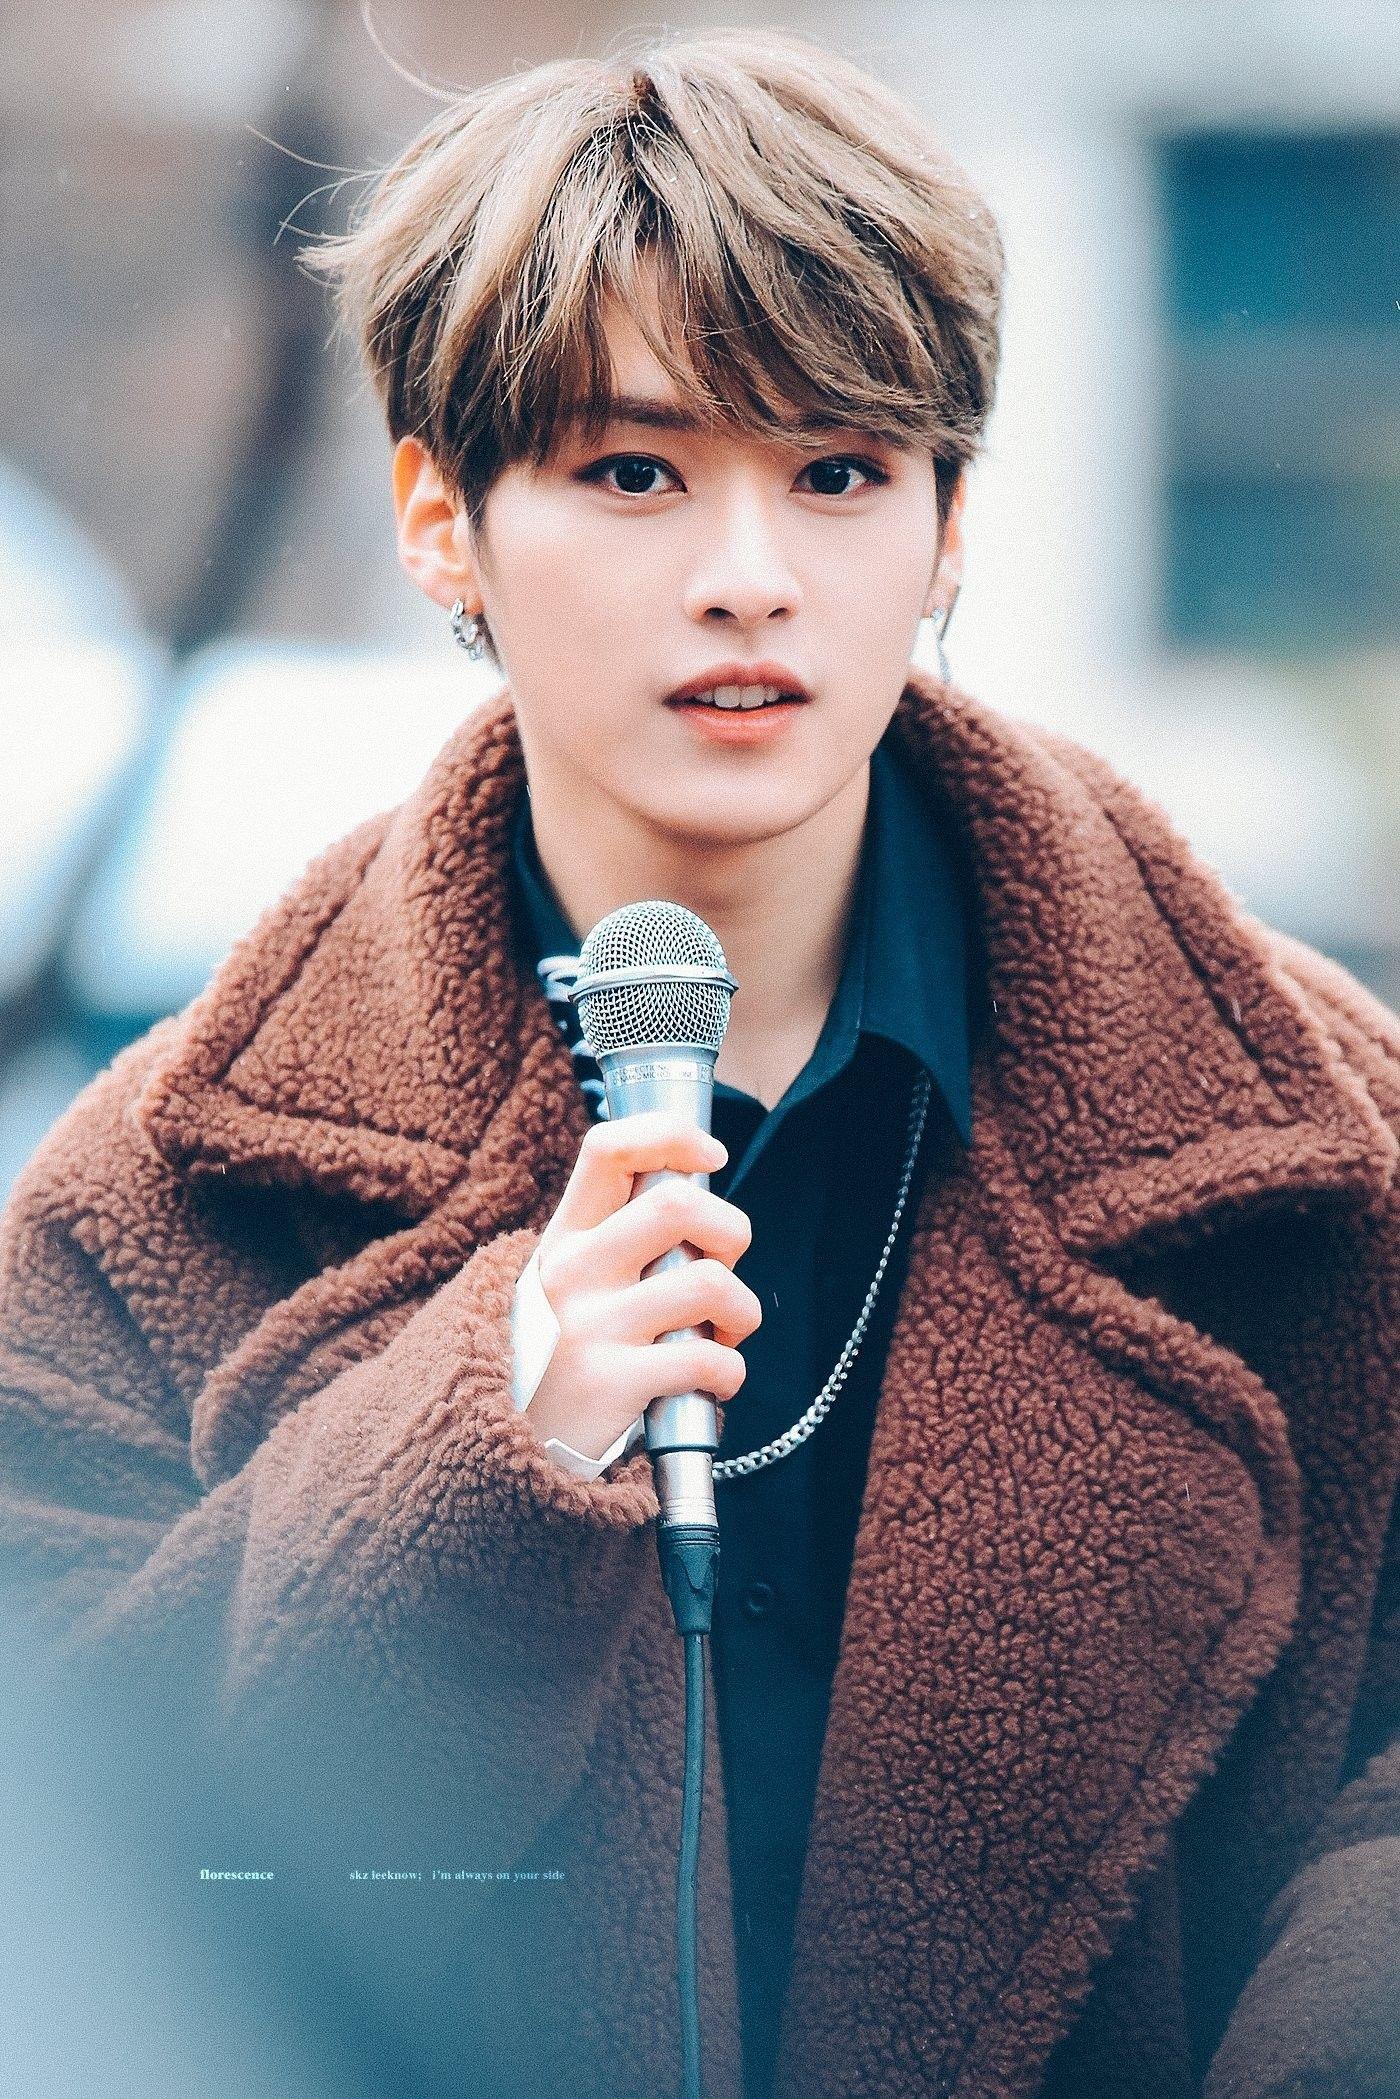 Hyunjin | Stray, Kids, Baby face